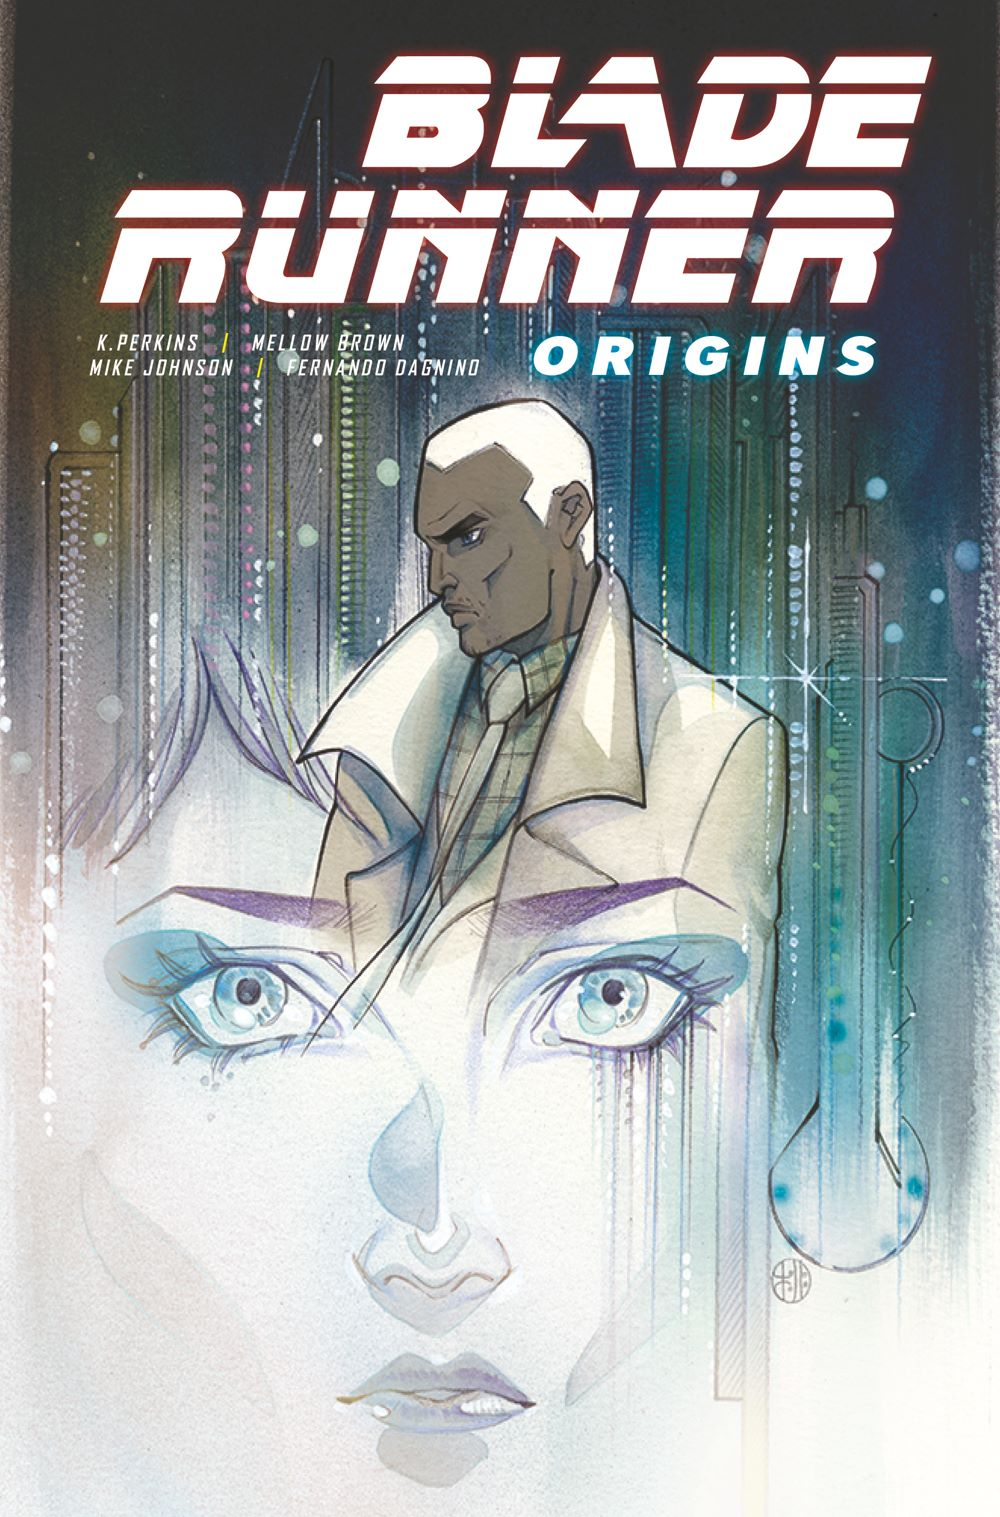 Blade-Runner-Origins_1_B_MOMOKO ComicList: Titan Comics New Releases for 03/10/2021